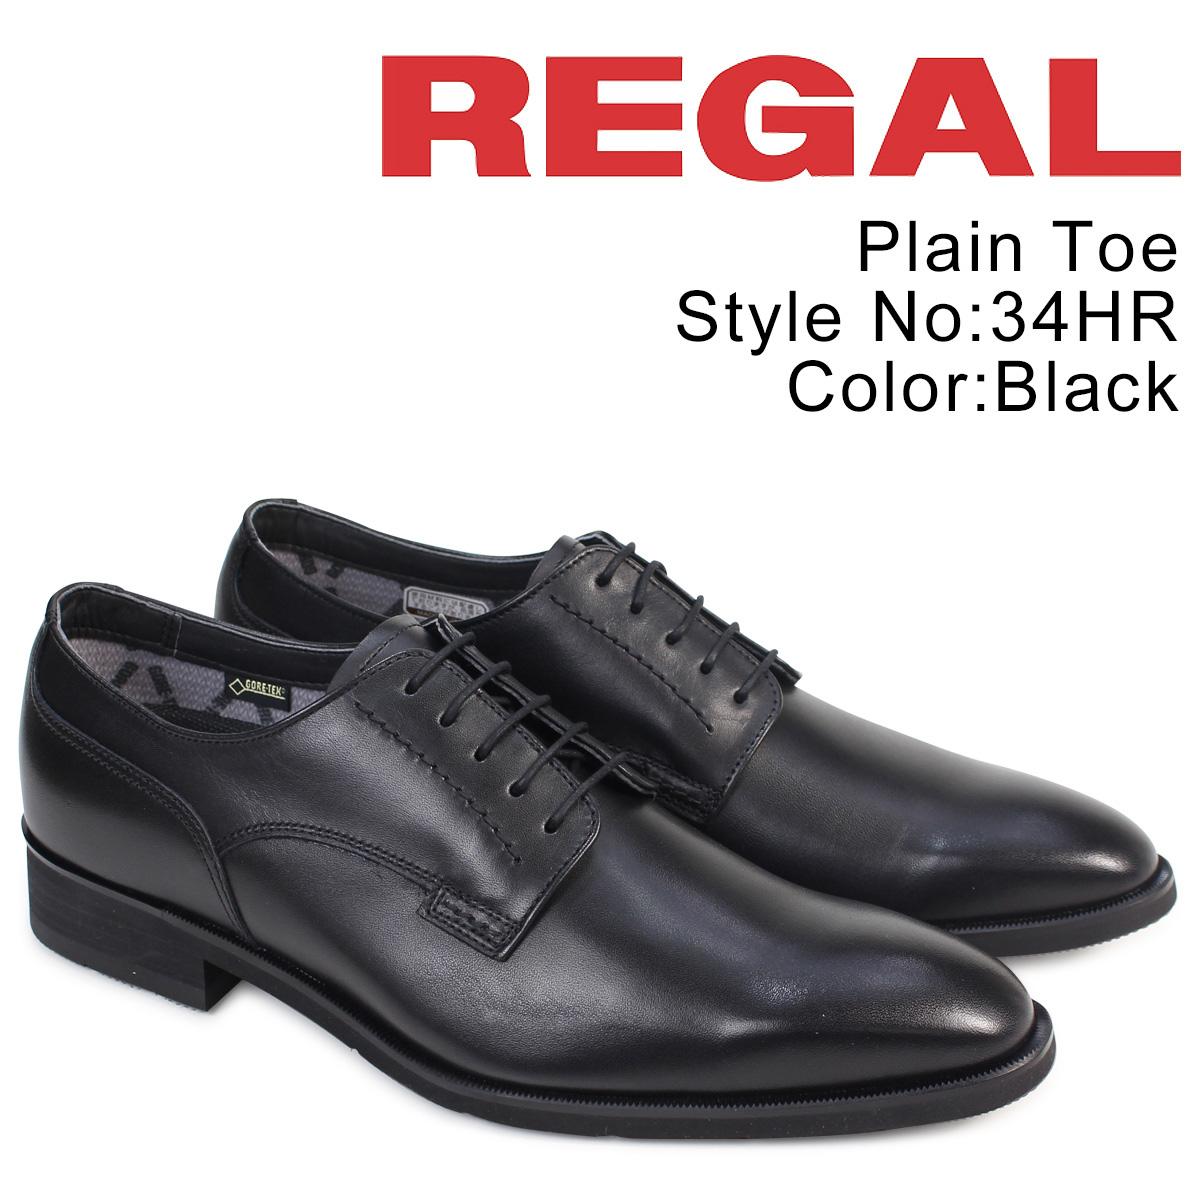 dba26118fc181 REGAL 34HR BB 靴 メンズ リーガル ビジネスシューズ プレーントゥ 防水 日本製 ブラック  7